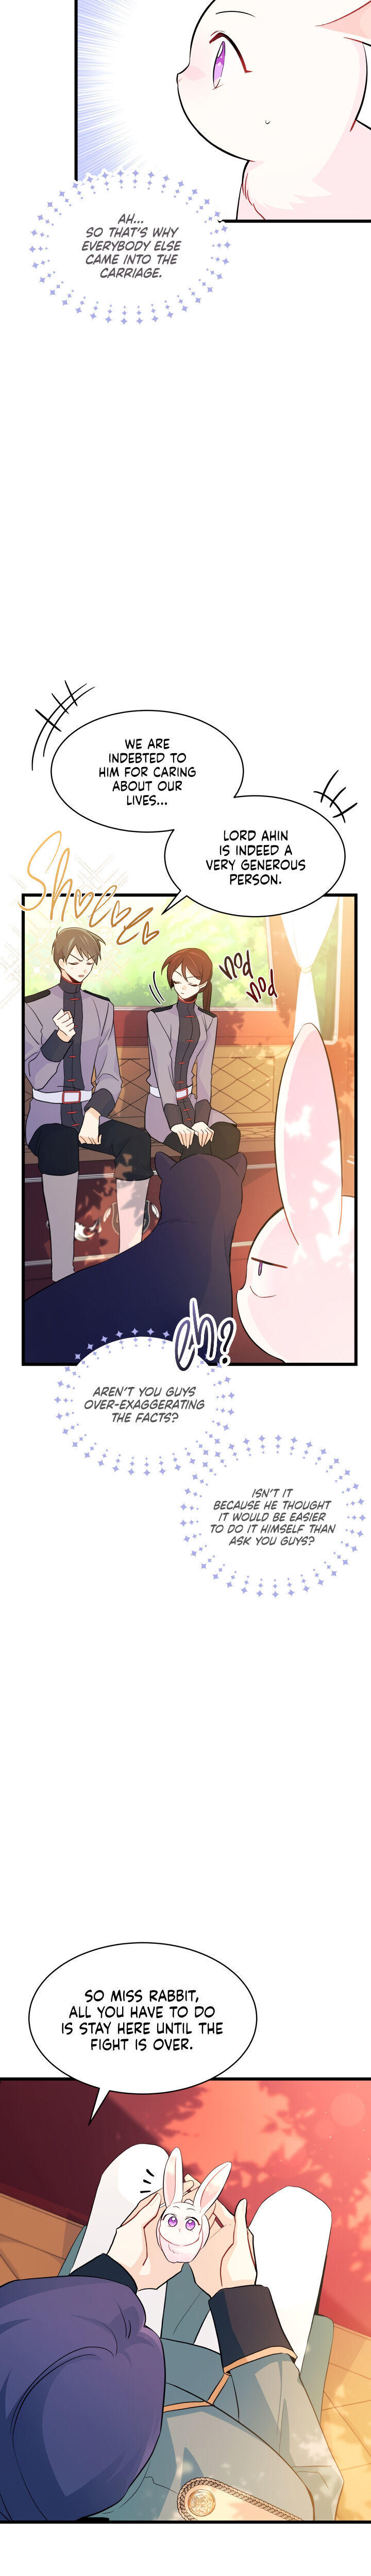 A Symbiotic Relationship Between A Rabbit And A Black Panther Chapter 27 page 19 - Mangakakalots.com